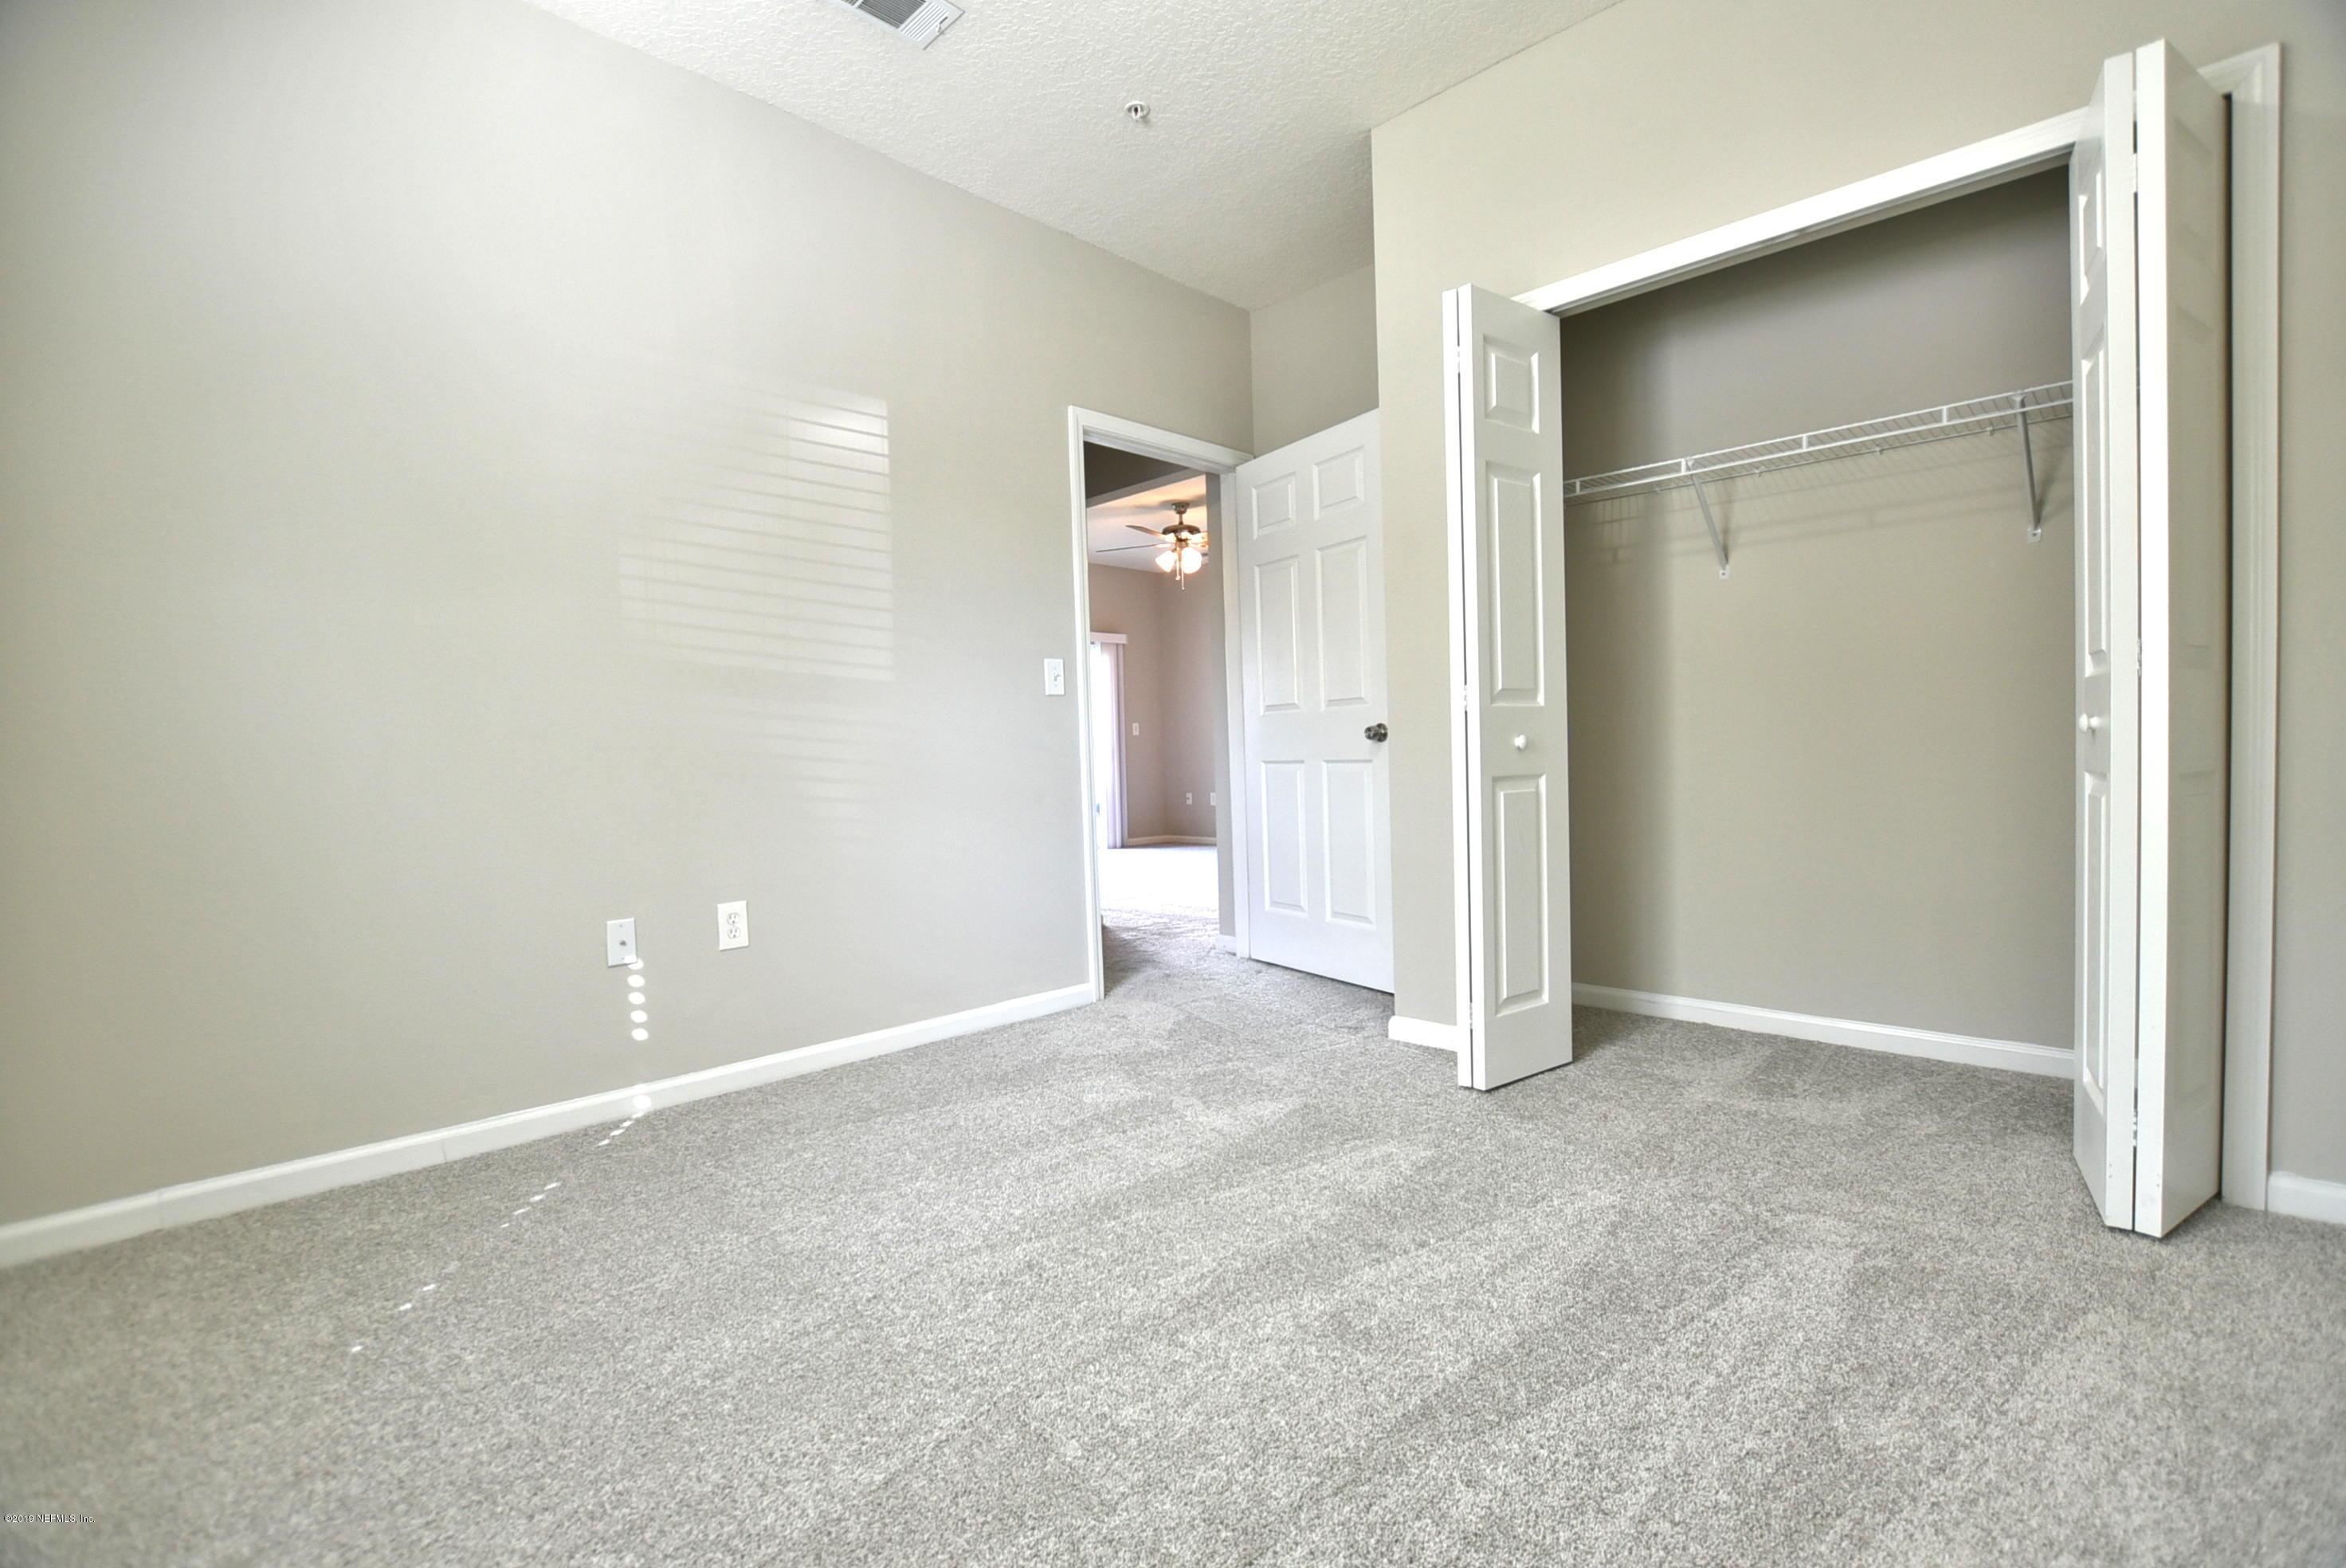 6925 ORTEGA WOODS, JACKSONVILLE, FLORIDA 32244, 3 Bedrooms Bedrooms, ,2 BathroomsBathrooms,Condo,For sale,ORTEGA WOODS,1021141